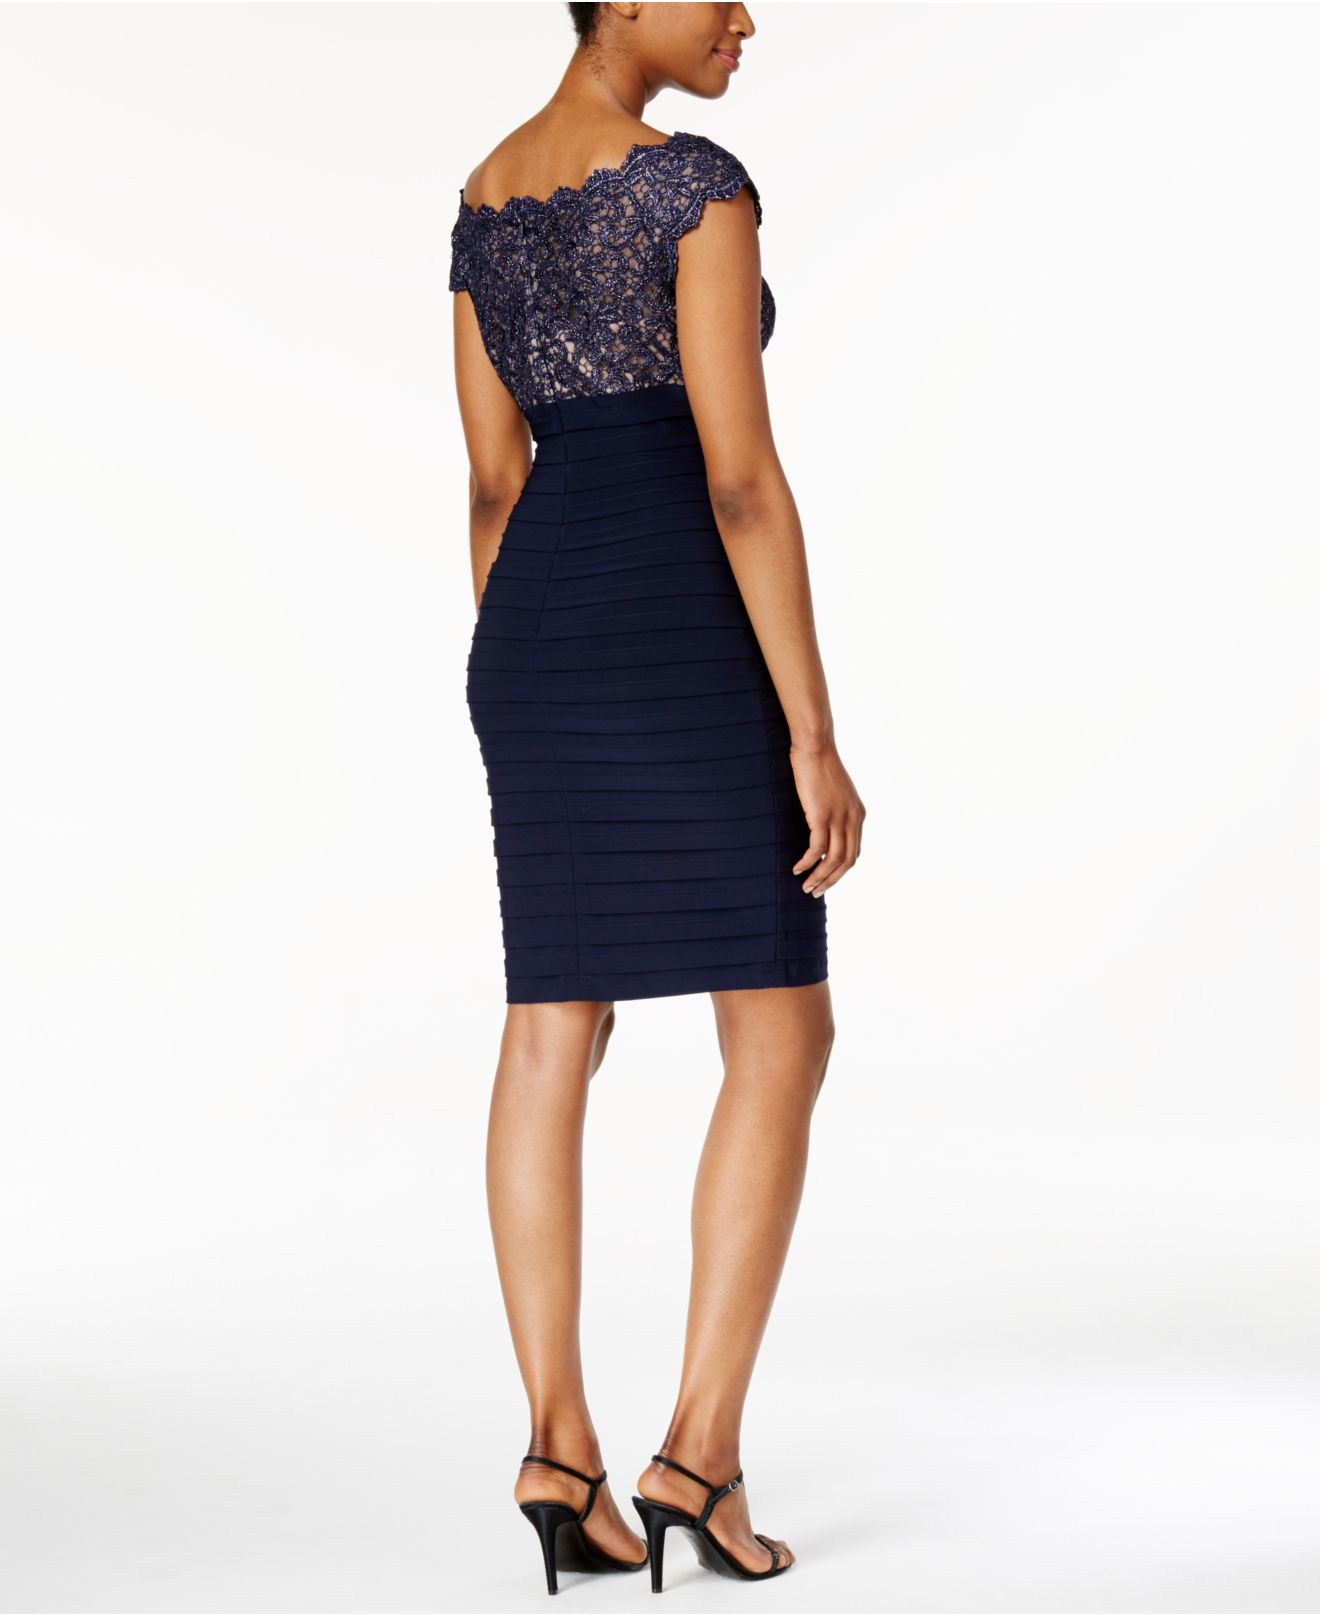 Macys Navy Blue Dresses: Xscape Lace Pleated Bodycon Dress In Blue